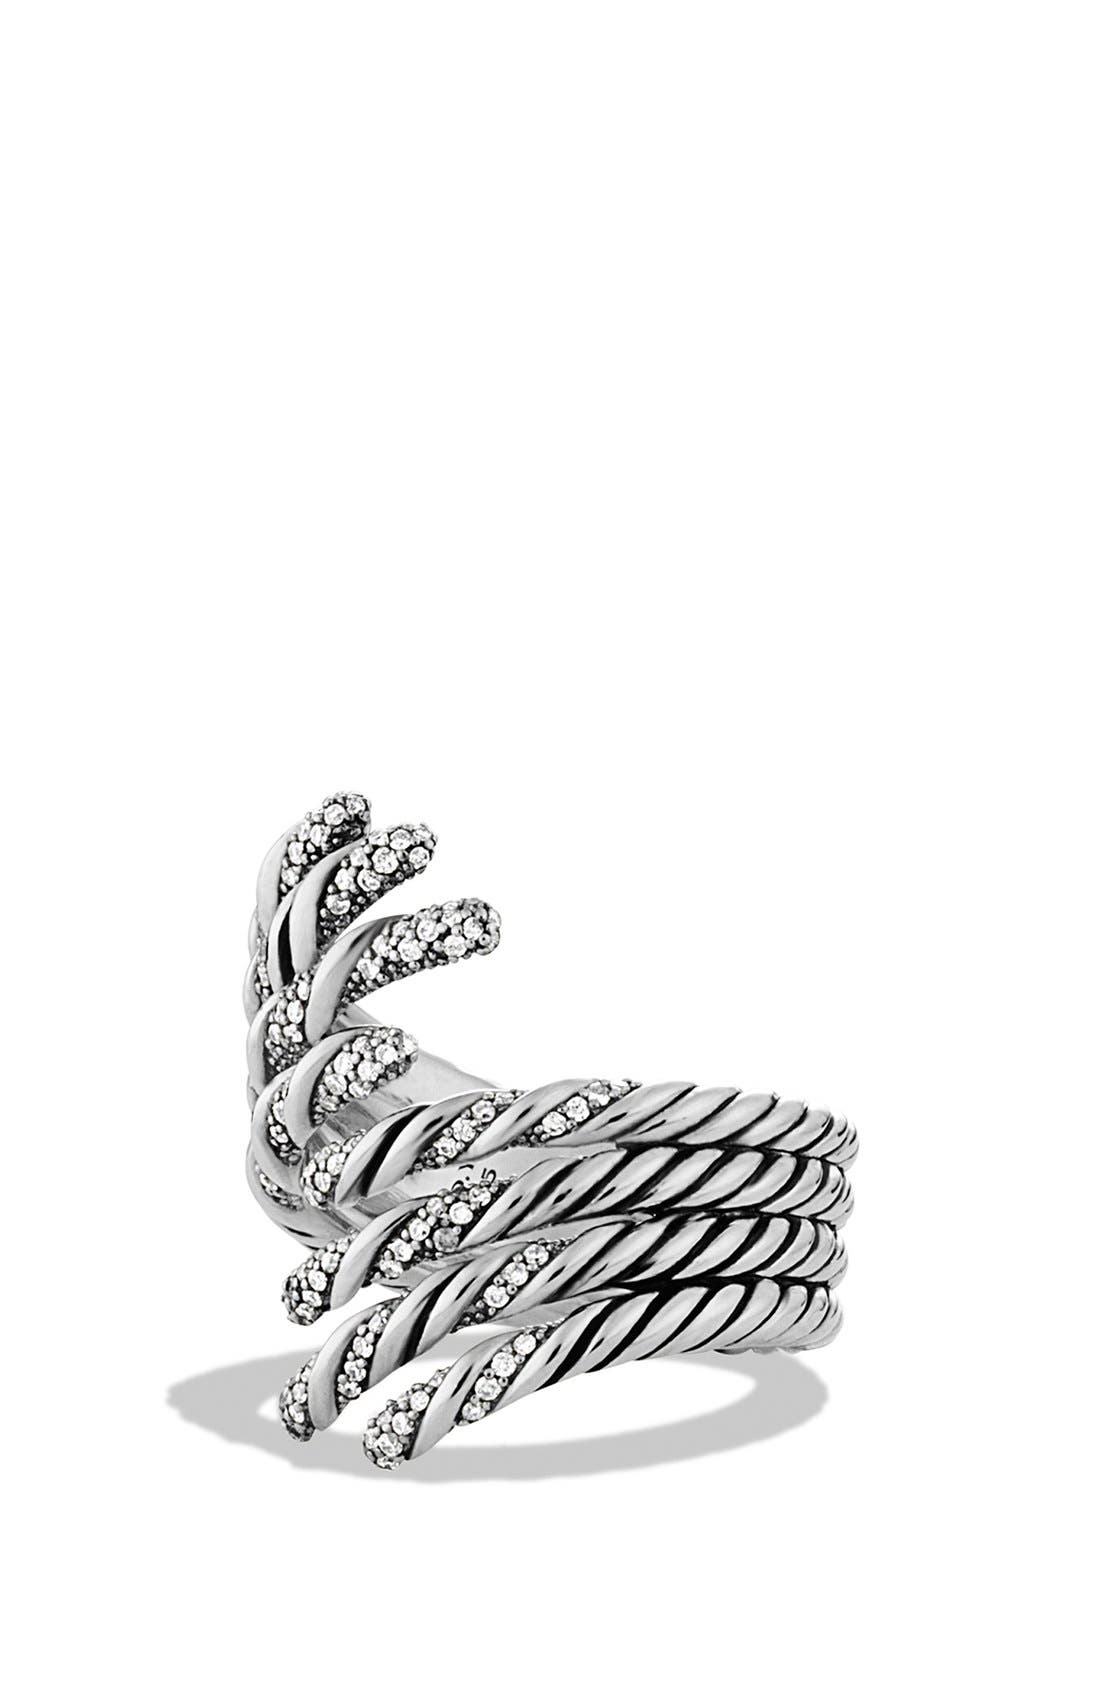 David Yurman 'Willow' Open Four-Row Ring with Diamonds